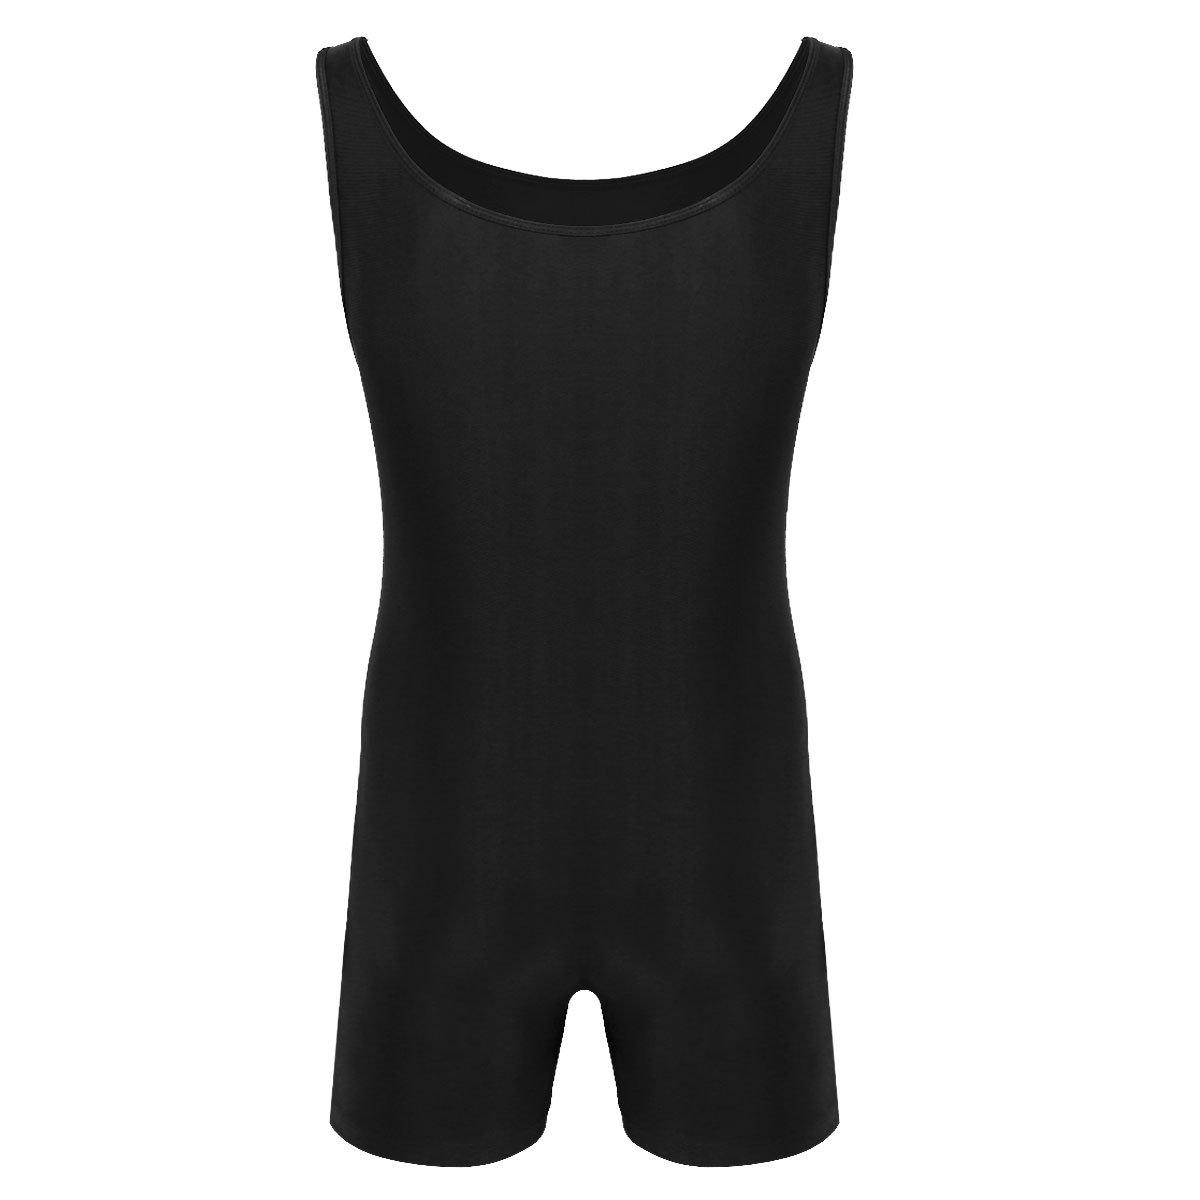 4112d11eff3 Amazon.com   YiZYiF Men s Lycra Spandex Short Tank Bodysuit Workout Dance  Biketard Unitards   Sports   Outdoors